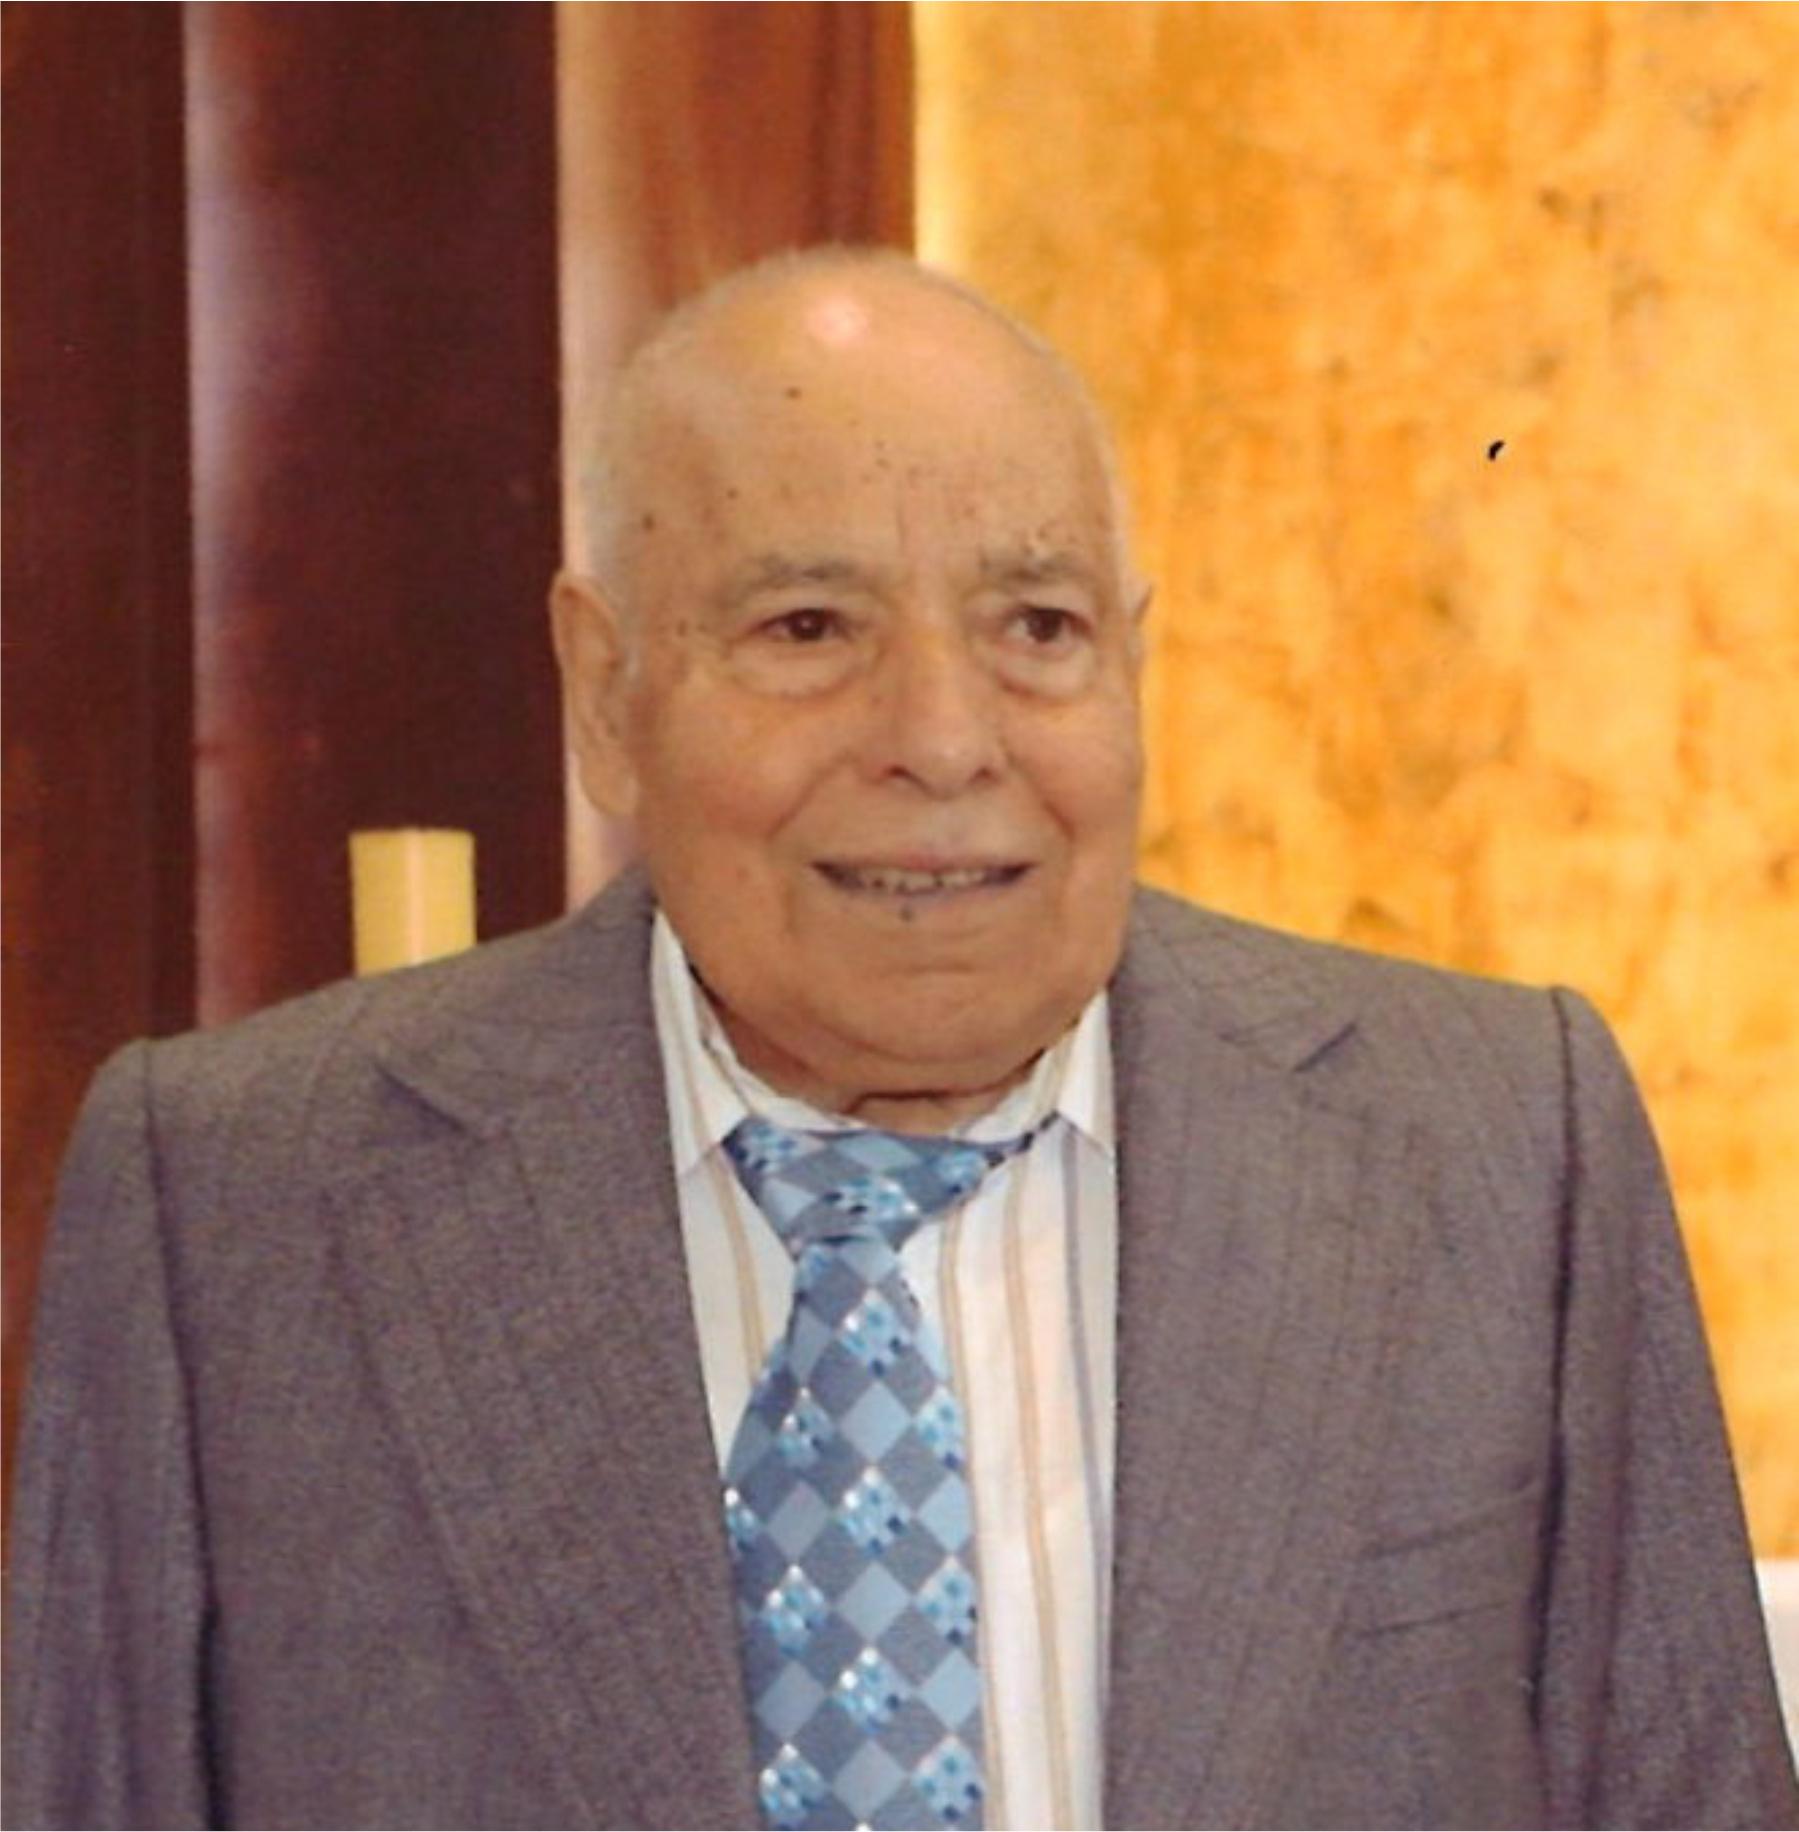 06-09-20 - Manuel Marques Felício - Venda Nova